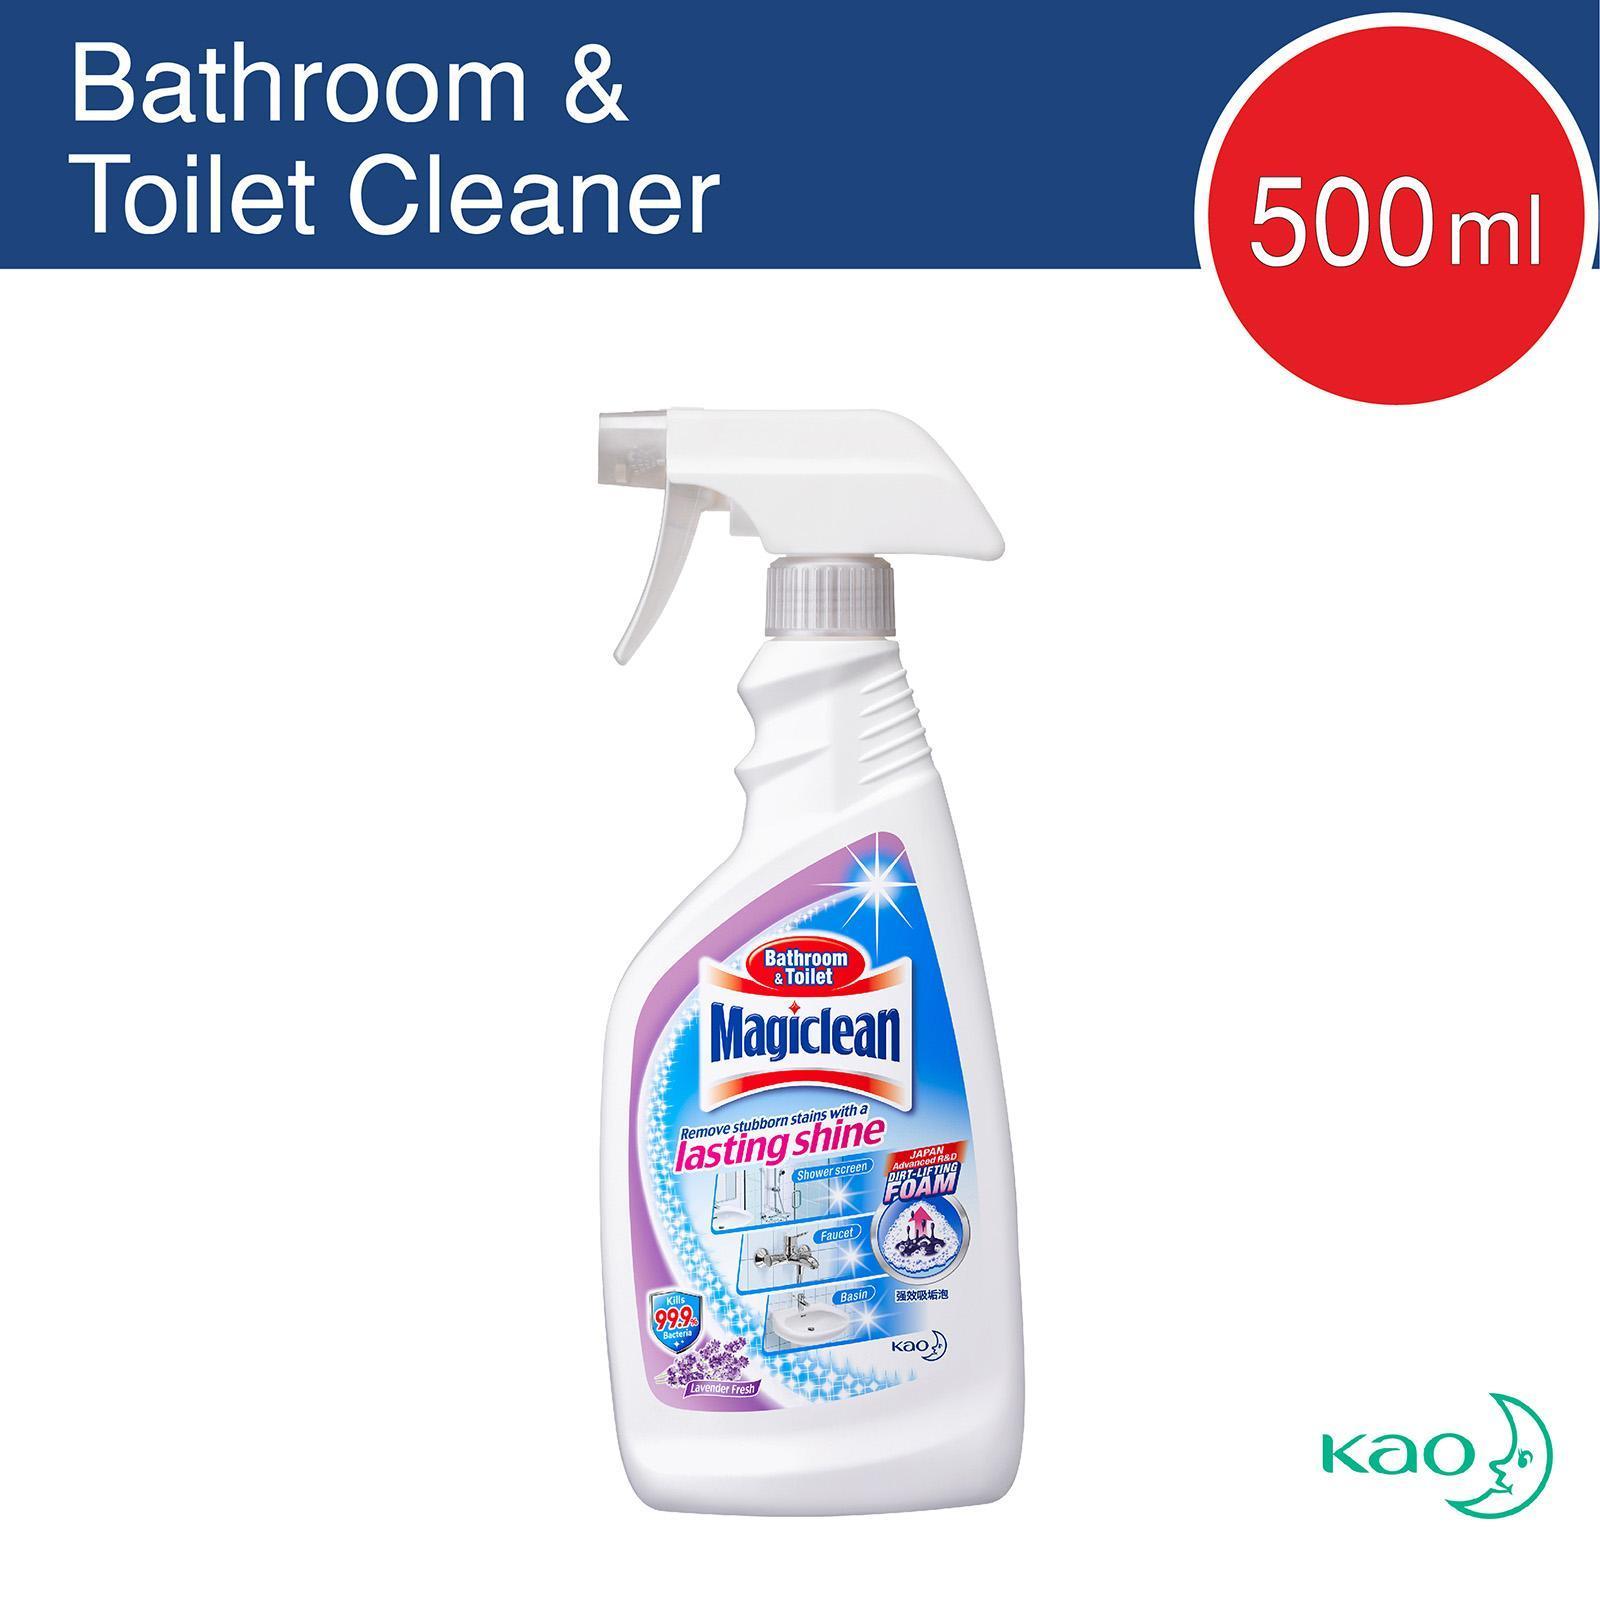 Magiclean Bathroom & Toilet Cleaner - Lavender Fresh